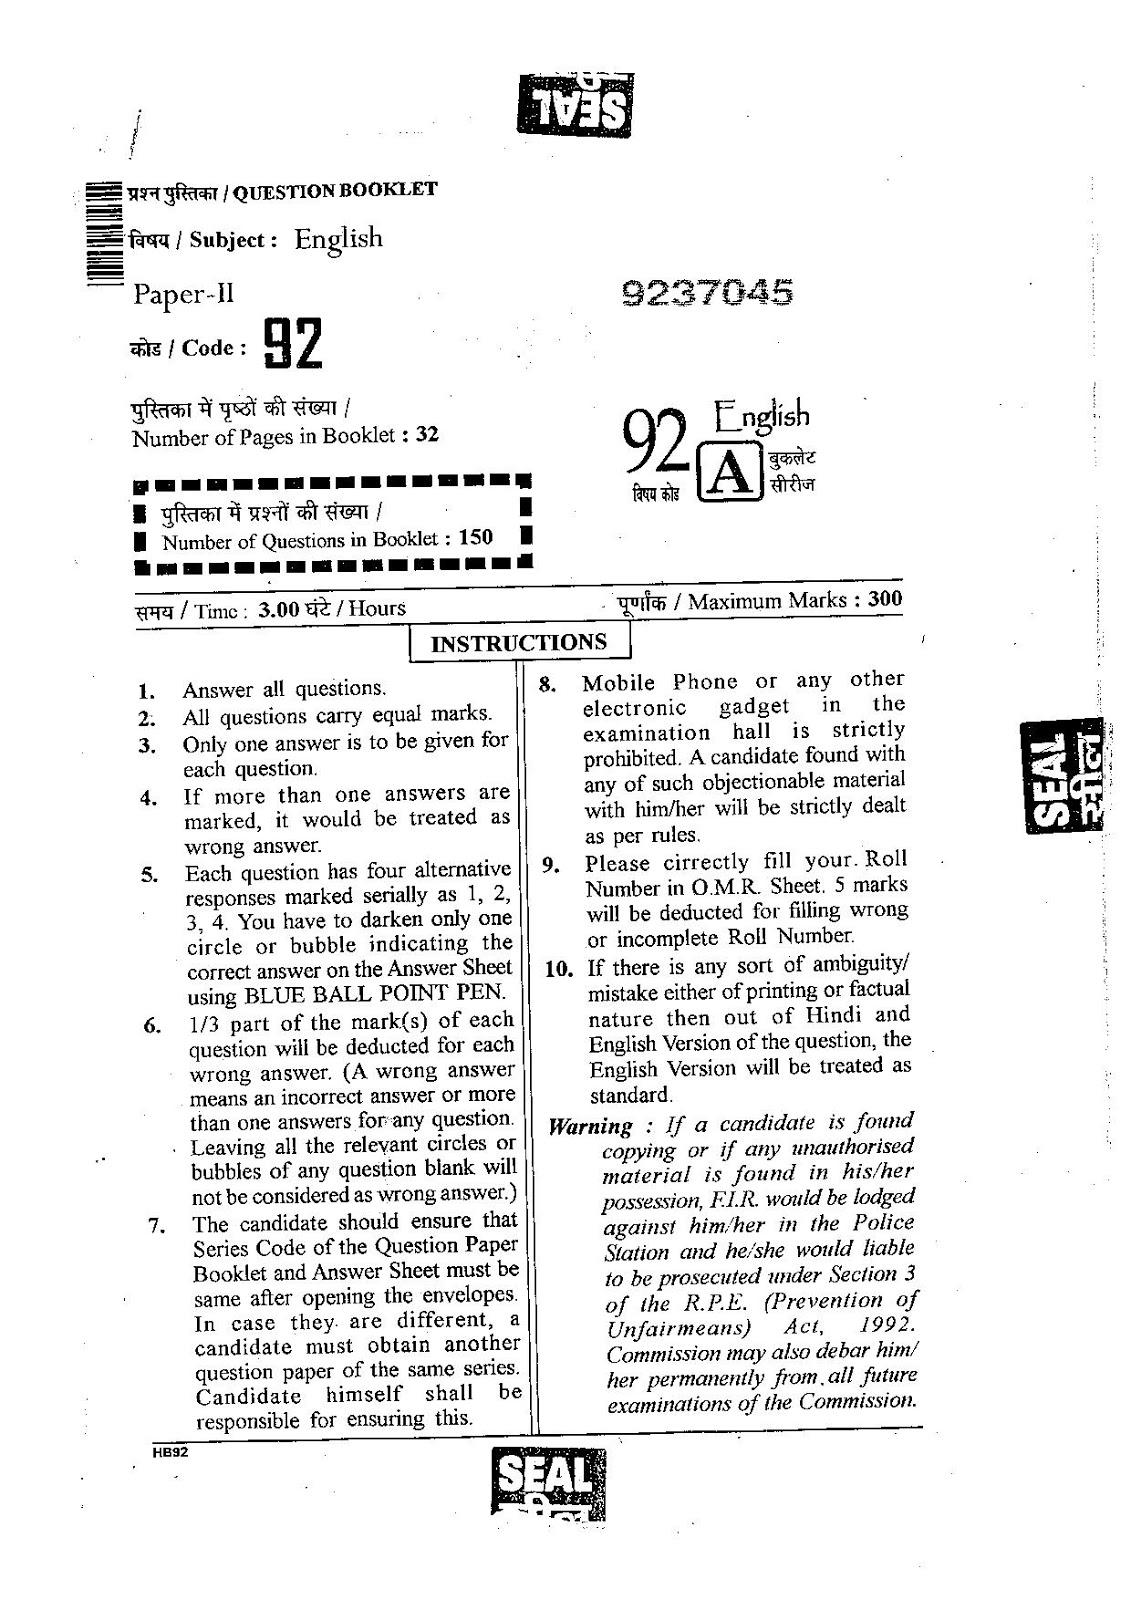 Free english exam papers - G C E  Advance Level (A/L) Exam Past